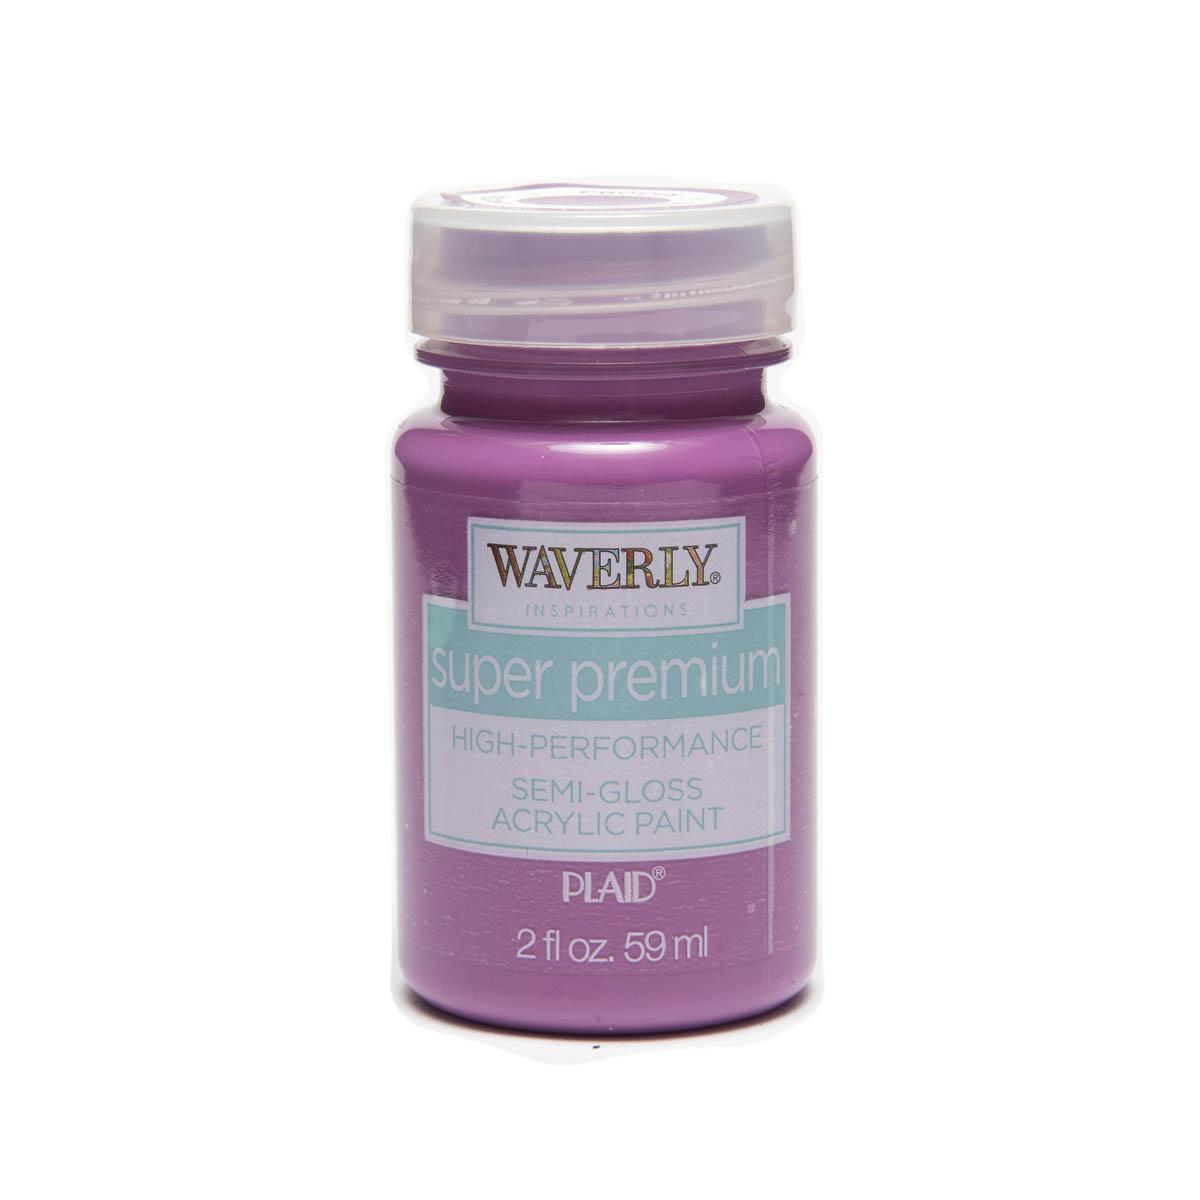 Waverly ® Inspirations Super Premium Semi-Gloss Acrylic Paint - Crocus, 2 oz.